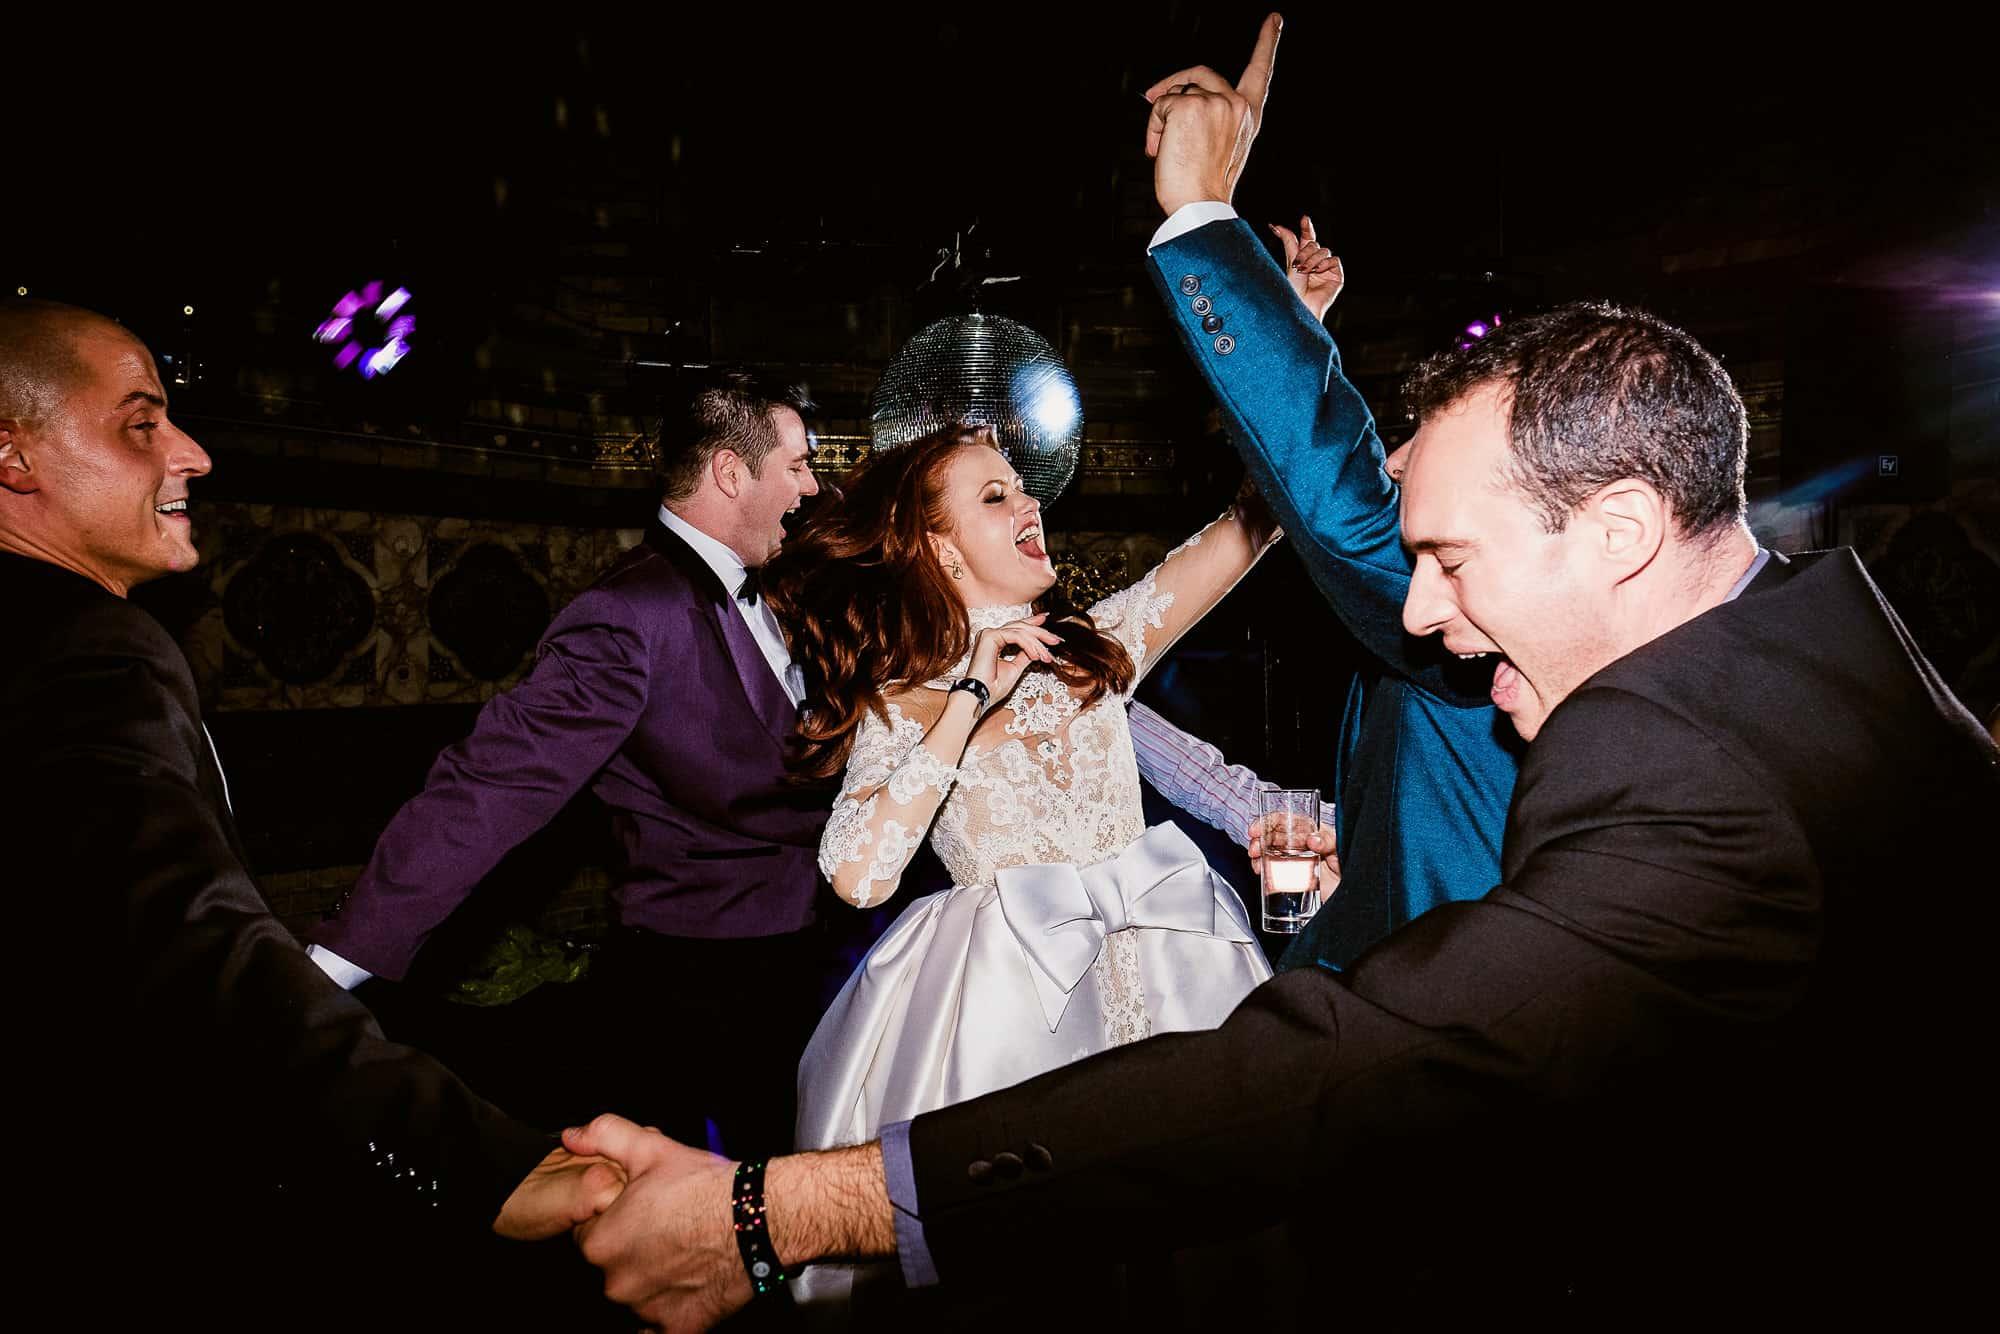 st-stephens-wedding-photographer-matt-tyler-0054